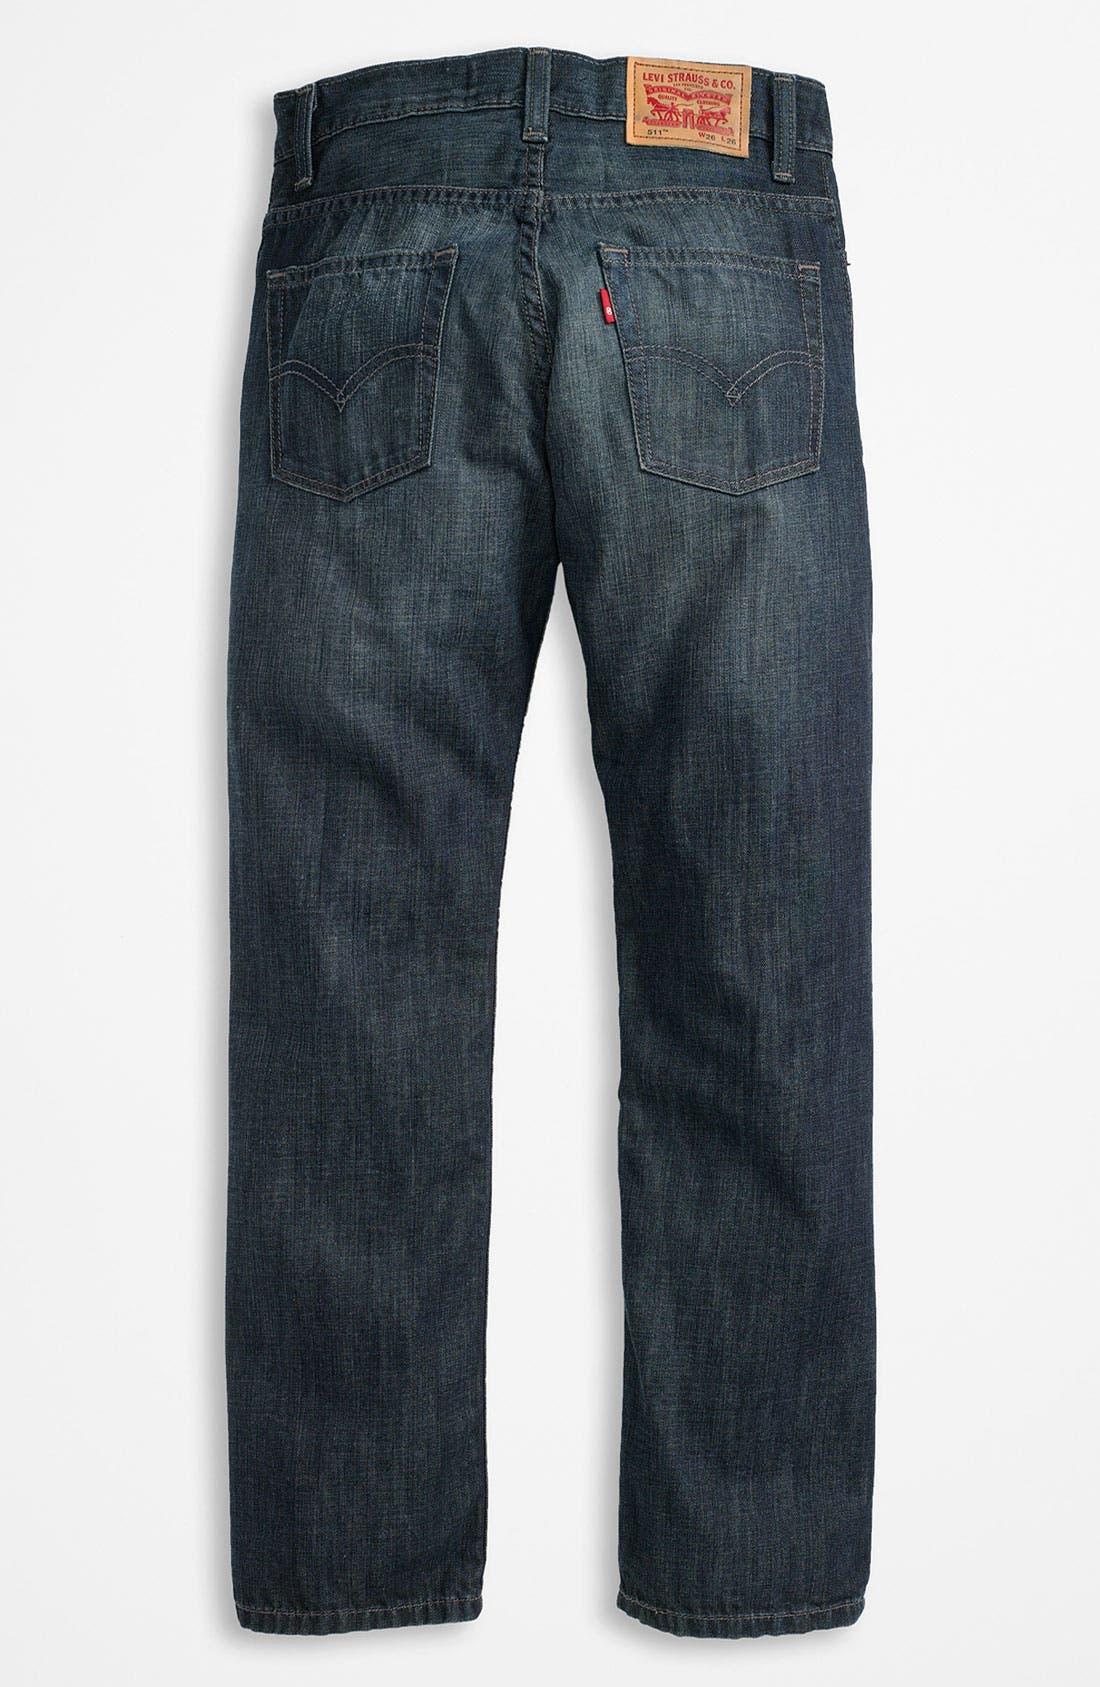 Main Image - Levi's® '511™' Jeans (Big Boys)